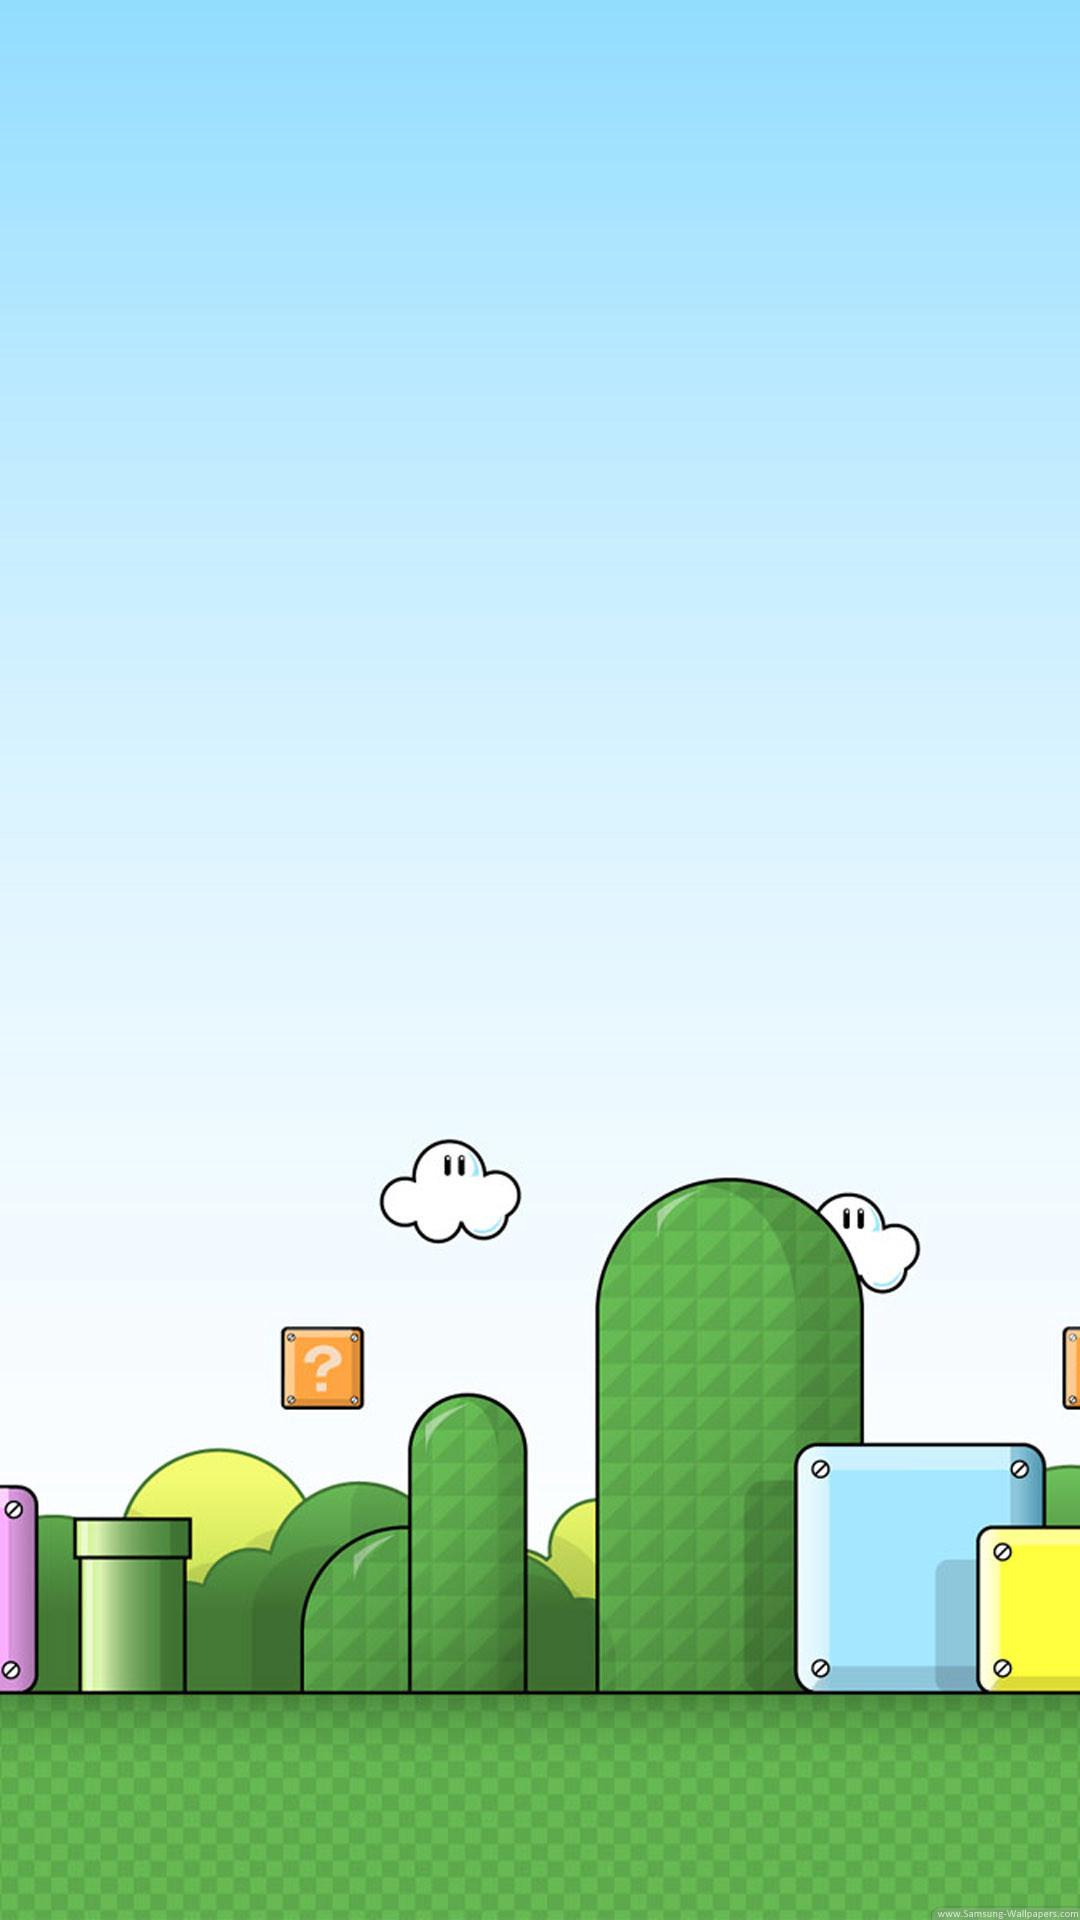 1080x1920, Super Mario World Mountains Wallpaper For - Mario Background Phone - HD Wallpaper